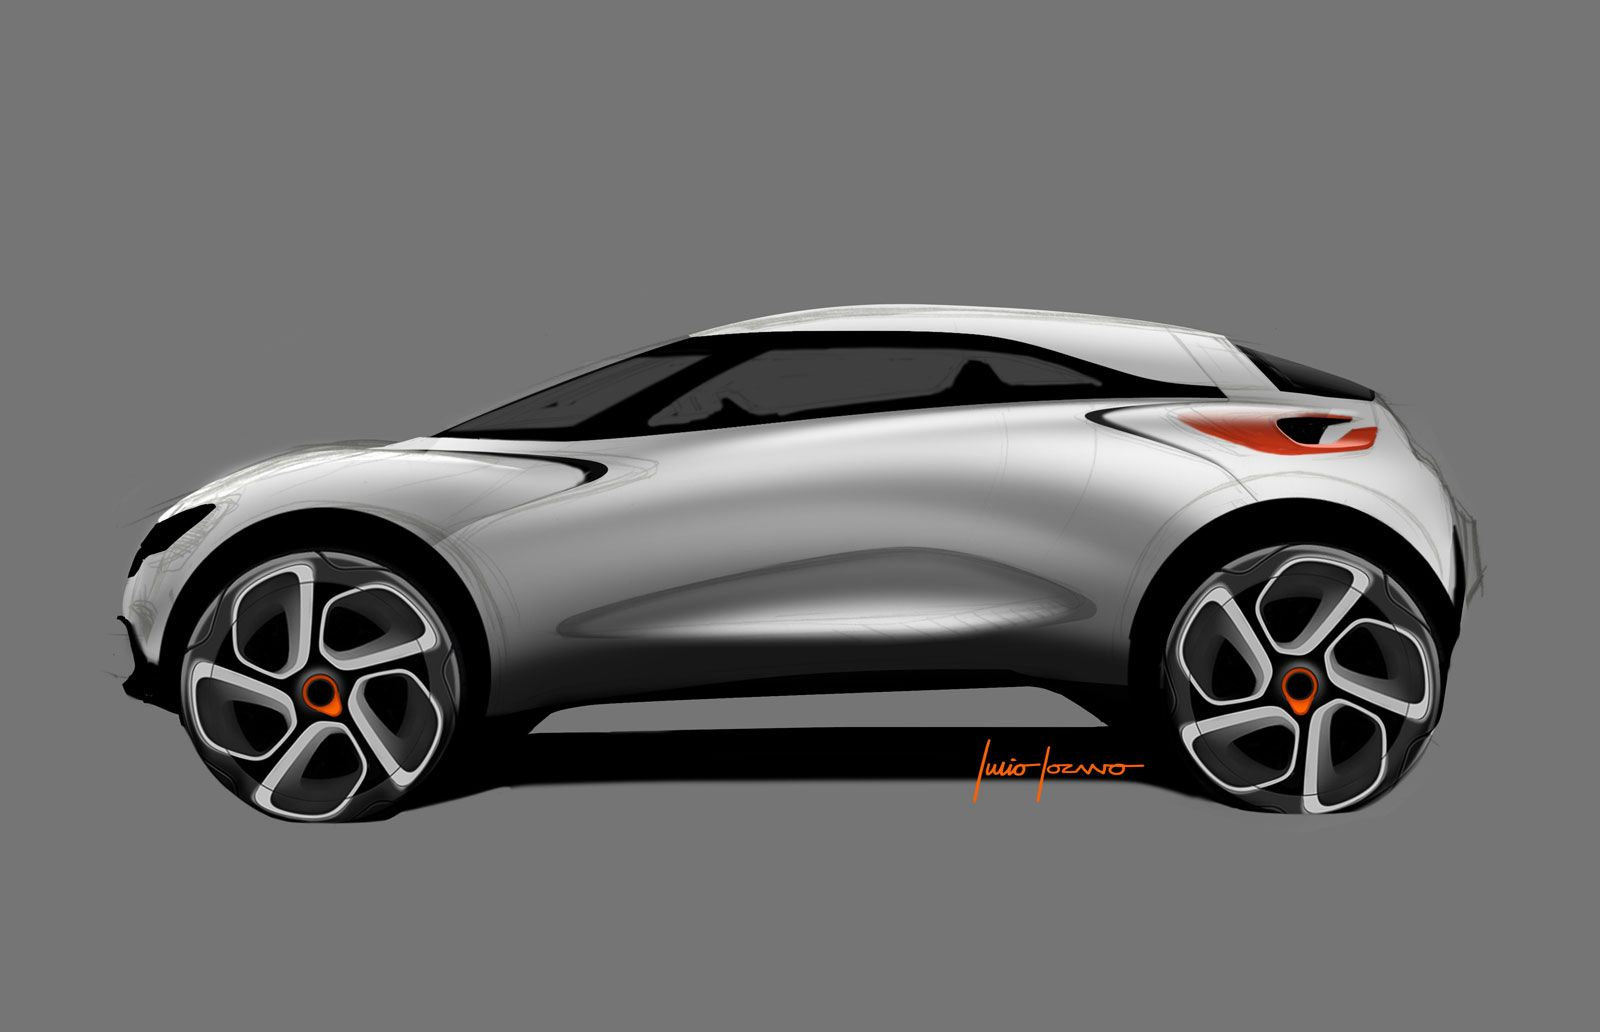 Renault Captur Concept Design Sketch Car Design Sketch Concept